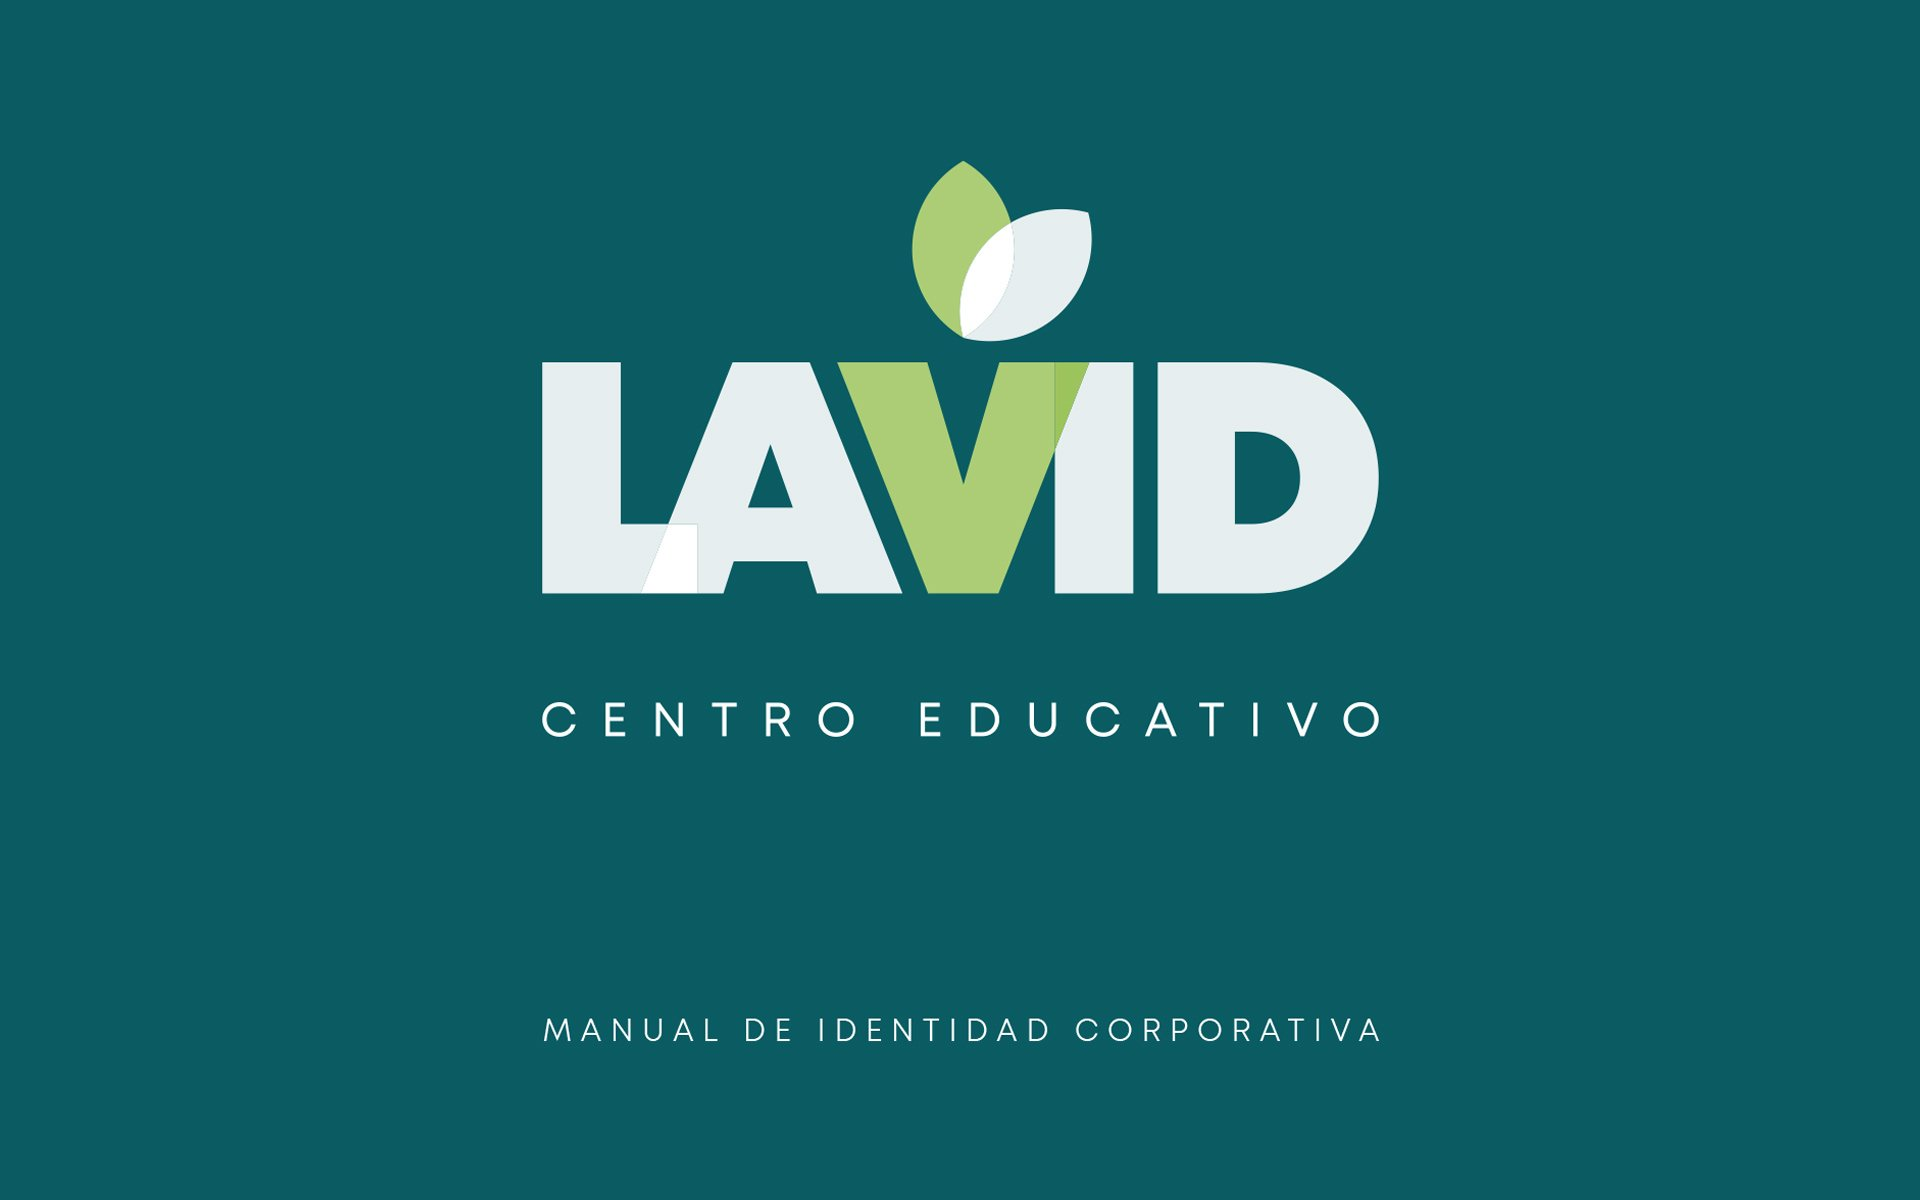 La Vid Educational Center 4